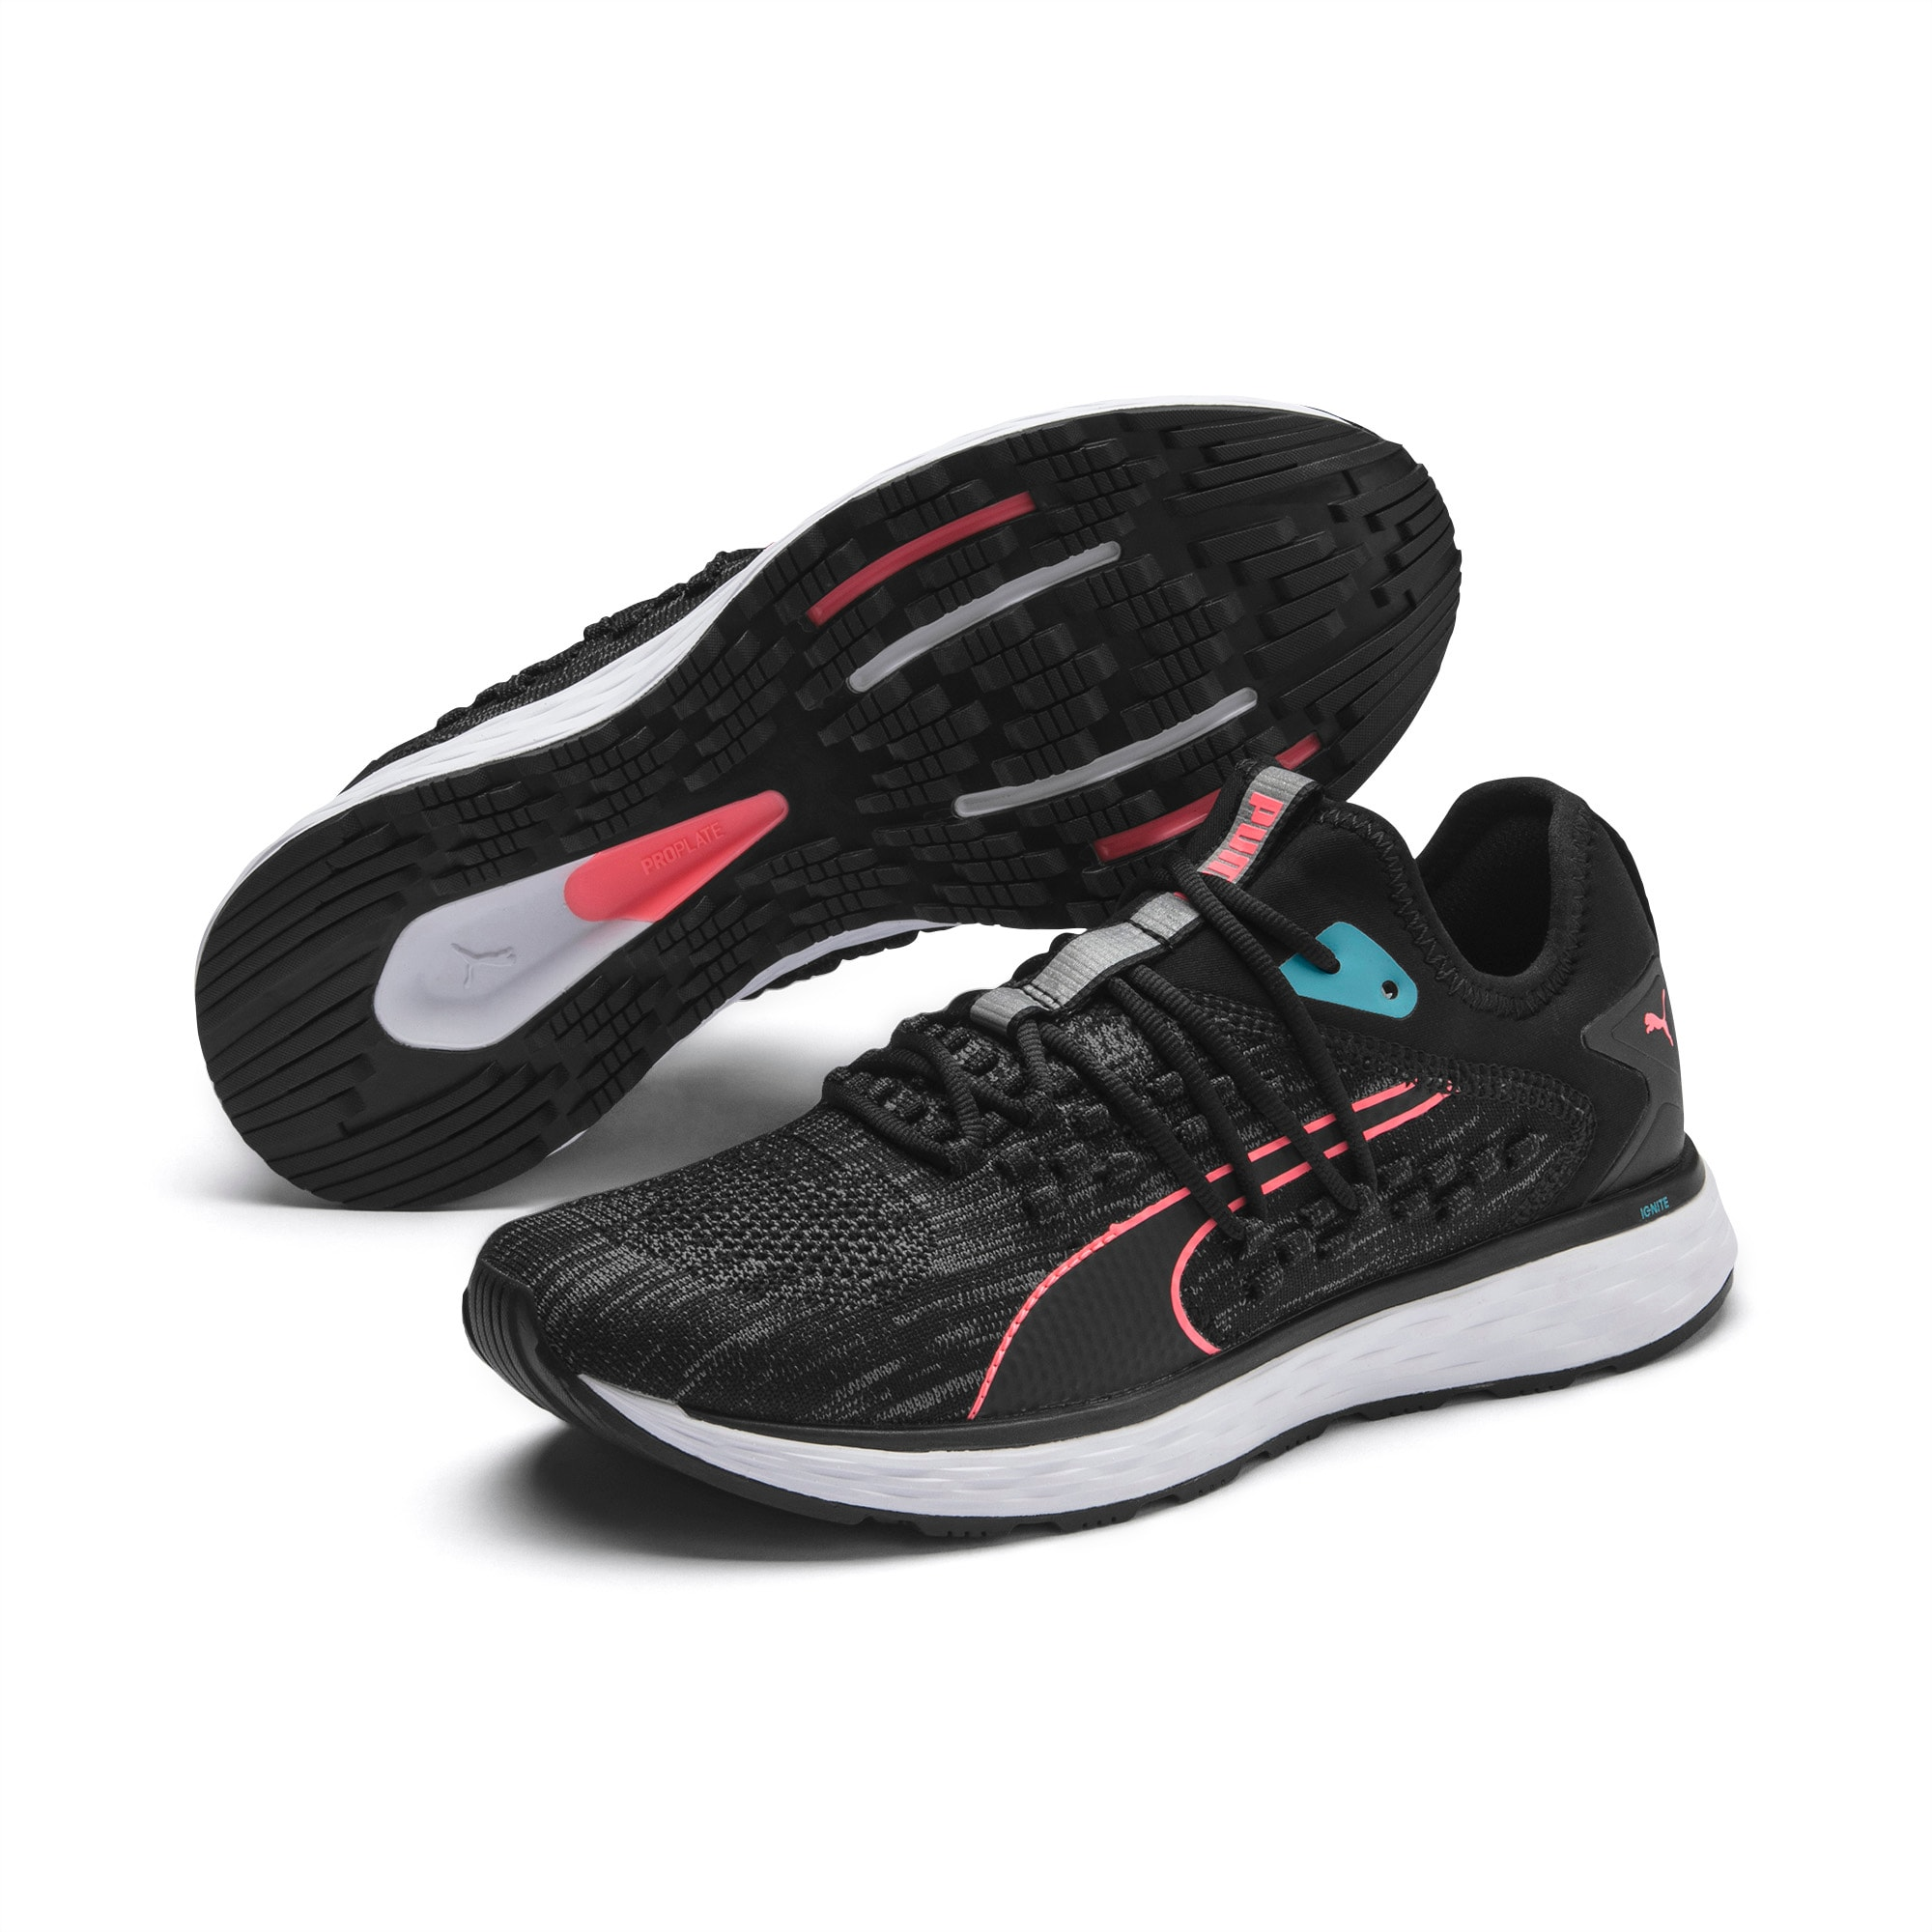 SPEED 600 FUSEFIT Women's Running Shoes